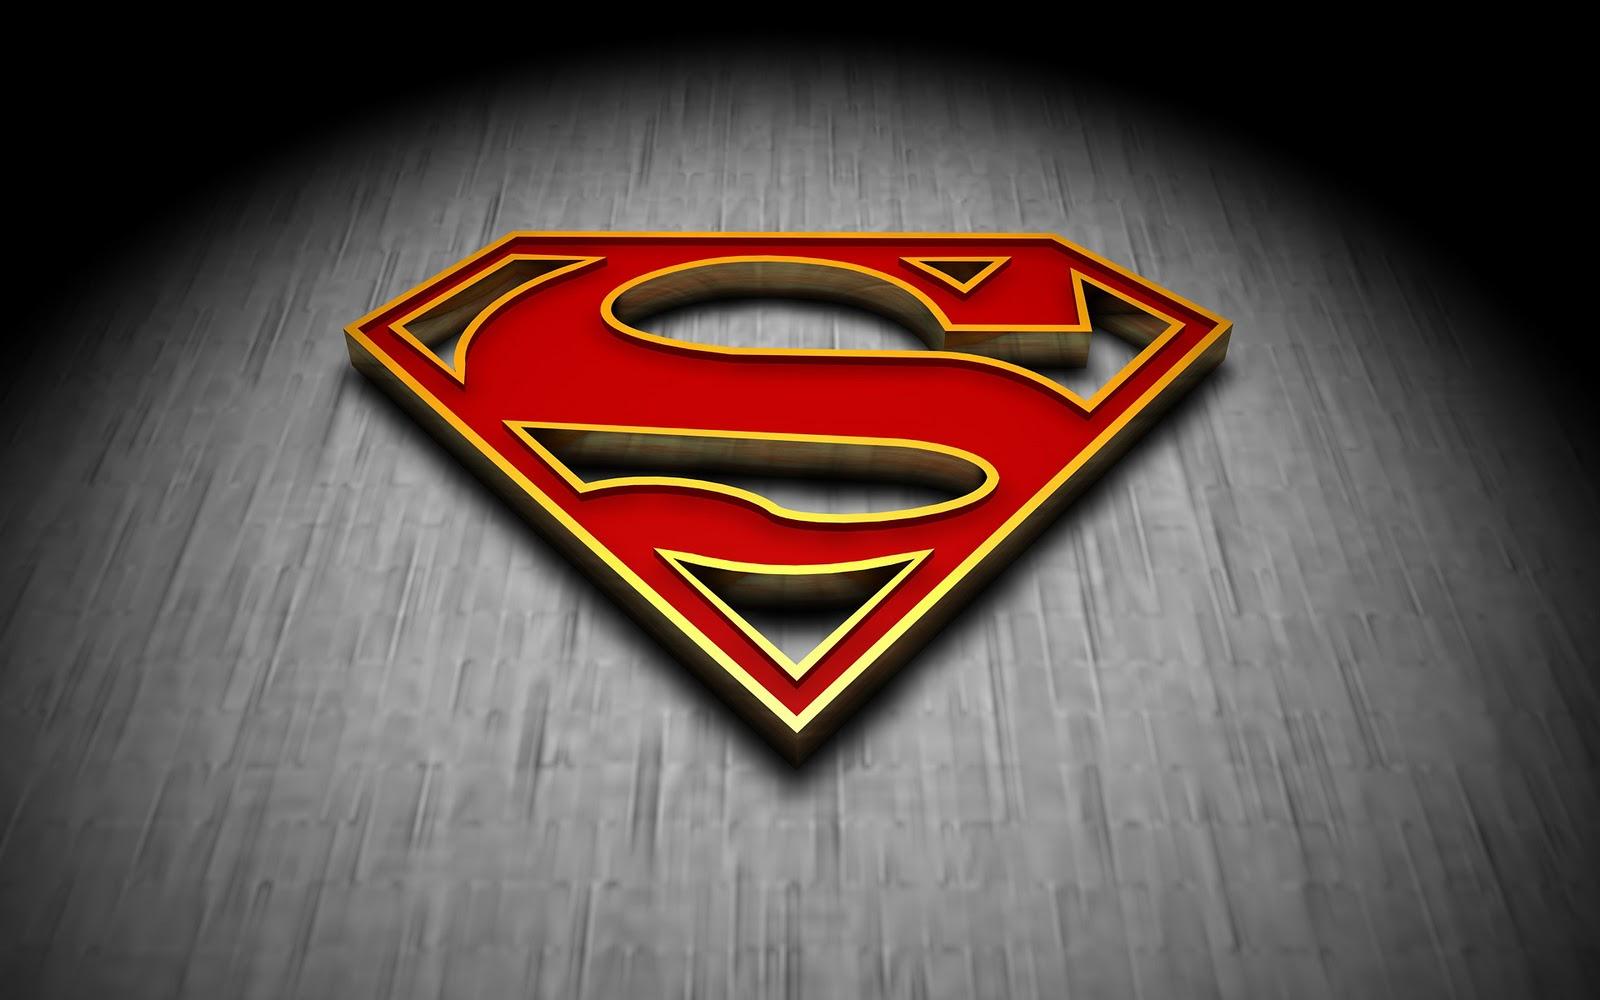 http://3.bp.blogspot.com/-hR7GVYFaLrs/TZnGFdVDNVI/AAAAAAAAGj8/8B1txyvz0Kg/s1600/Superman-achtergronden-hd-superman-wallpapers-afbeelding-3.jpg